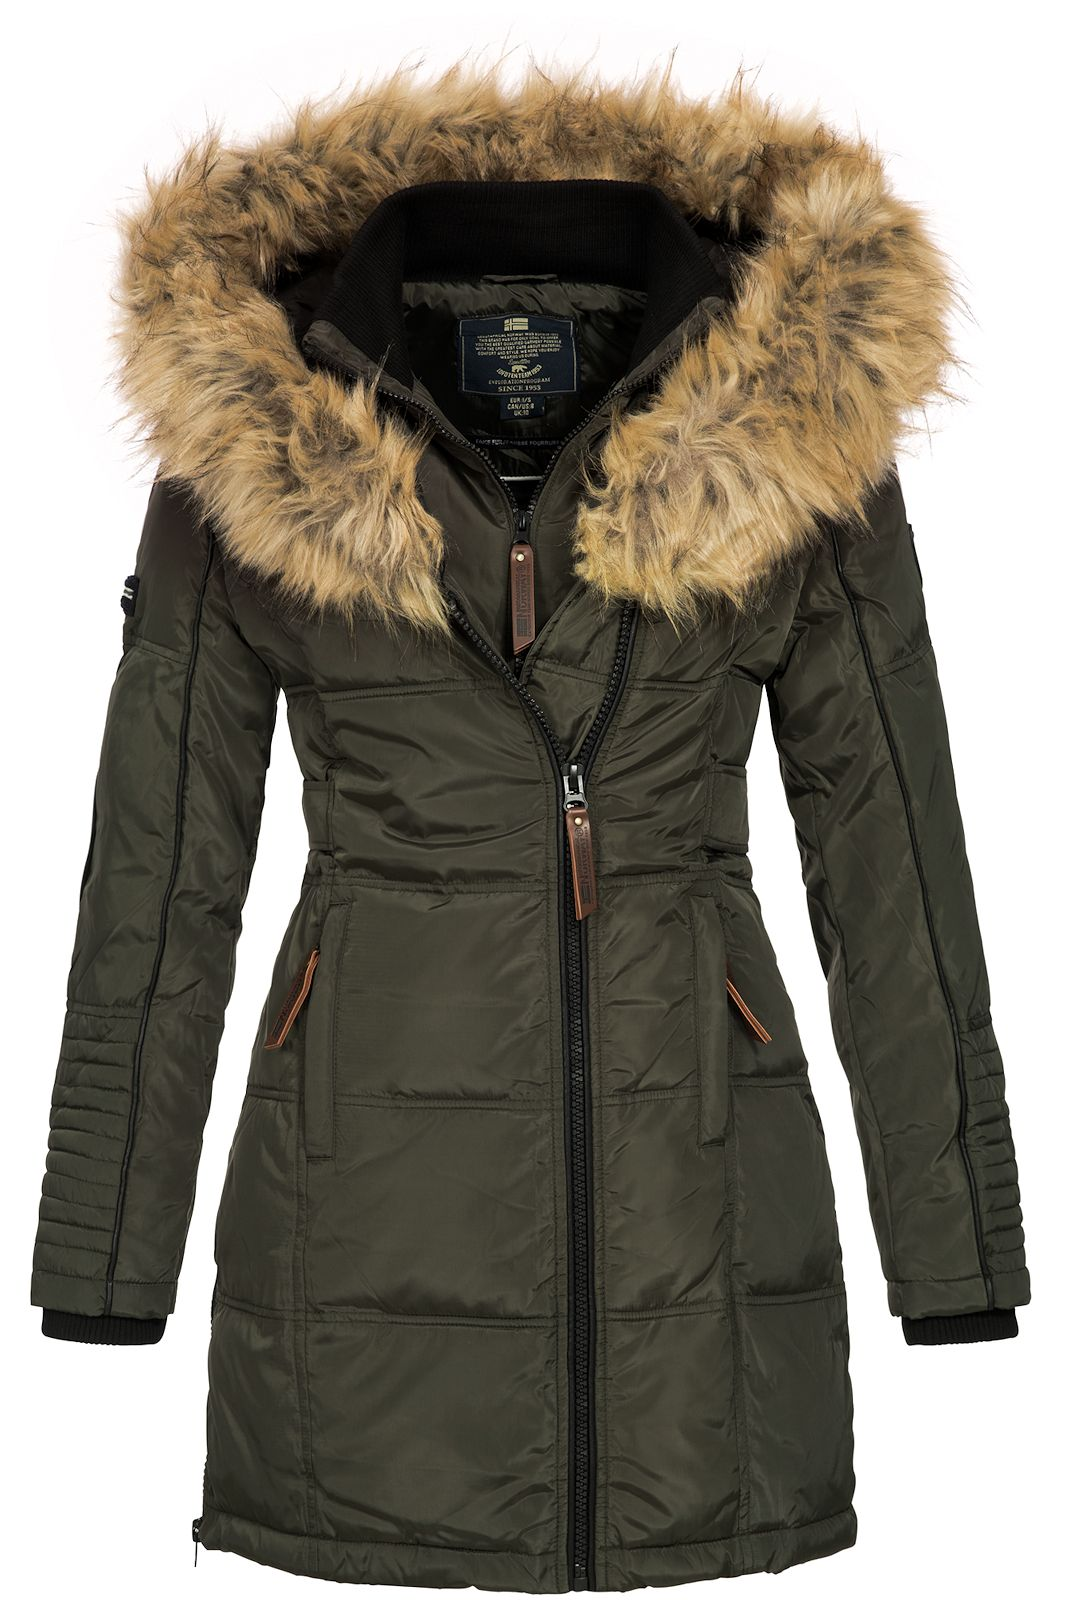 buy online d1152 3af49 Details zu Geographical Norway Damen Winterparka Belissima kurz Mantel  Jacke Ski Anorak